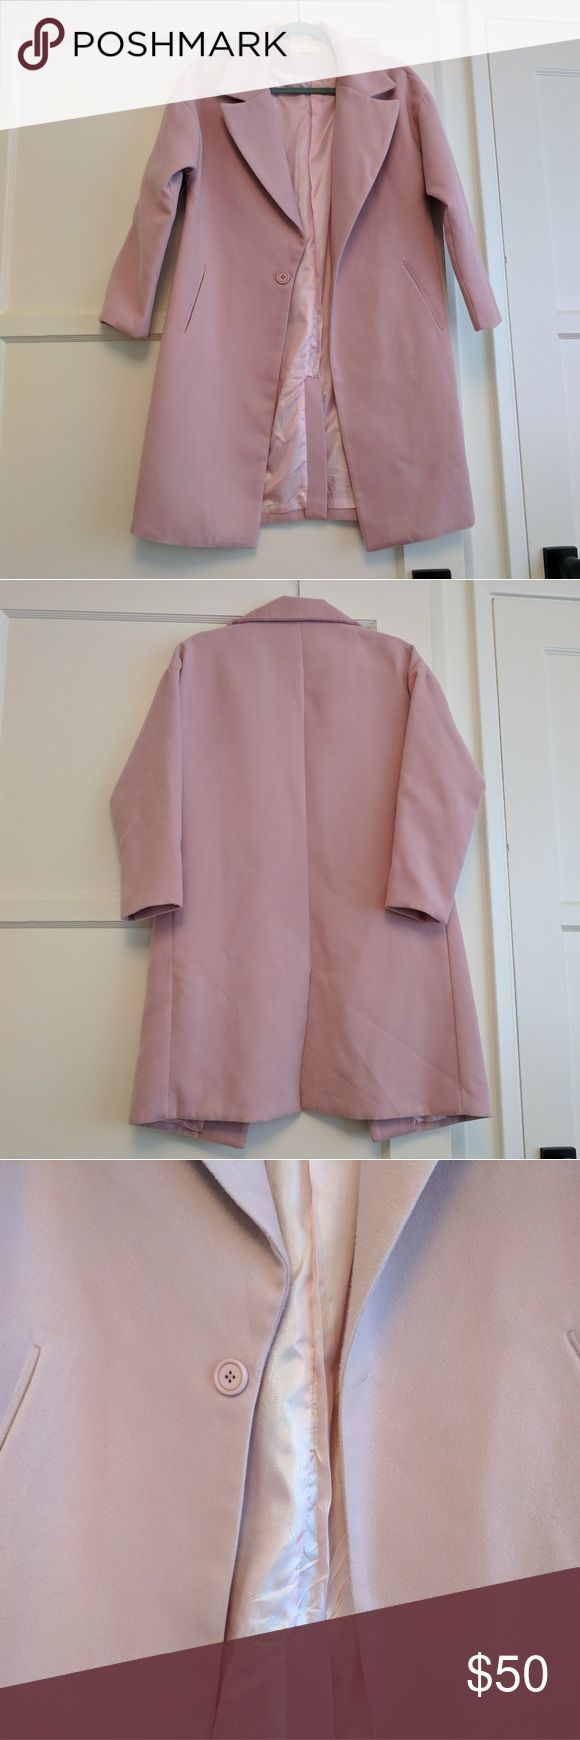 Pink cocoon coat Super soft pink coat. Korean brand.  Worn only once. Jackets & Coats